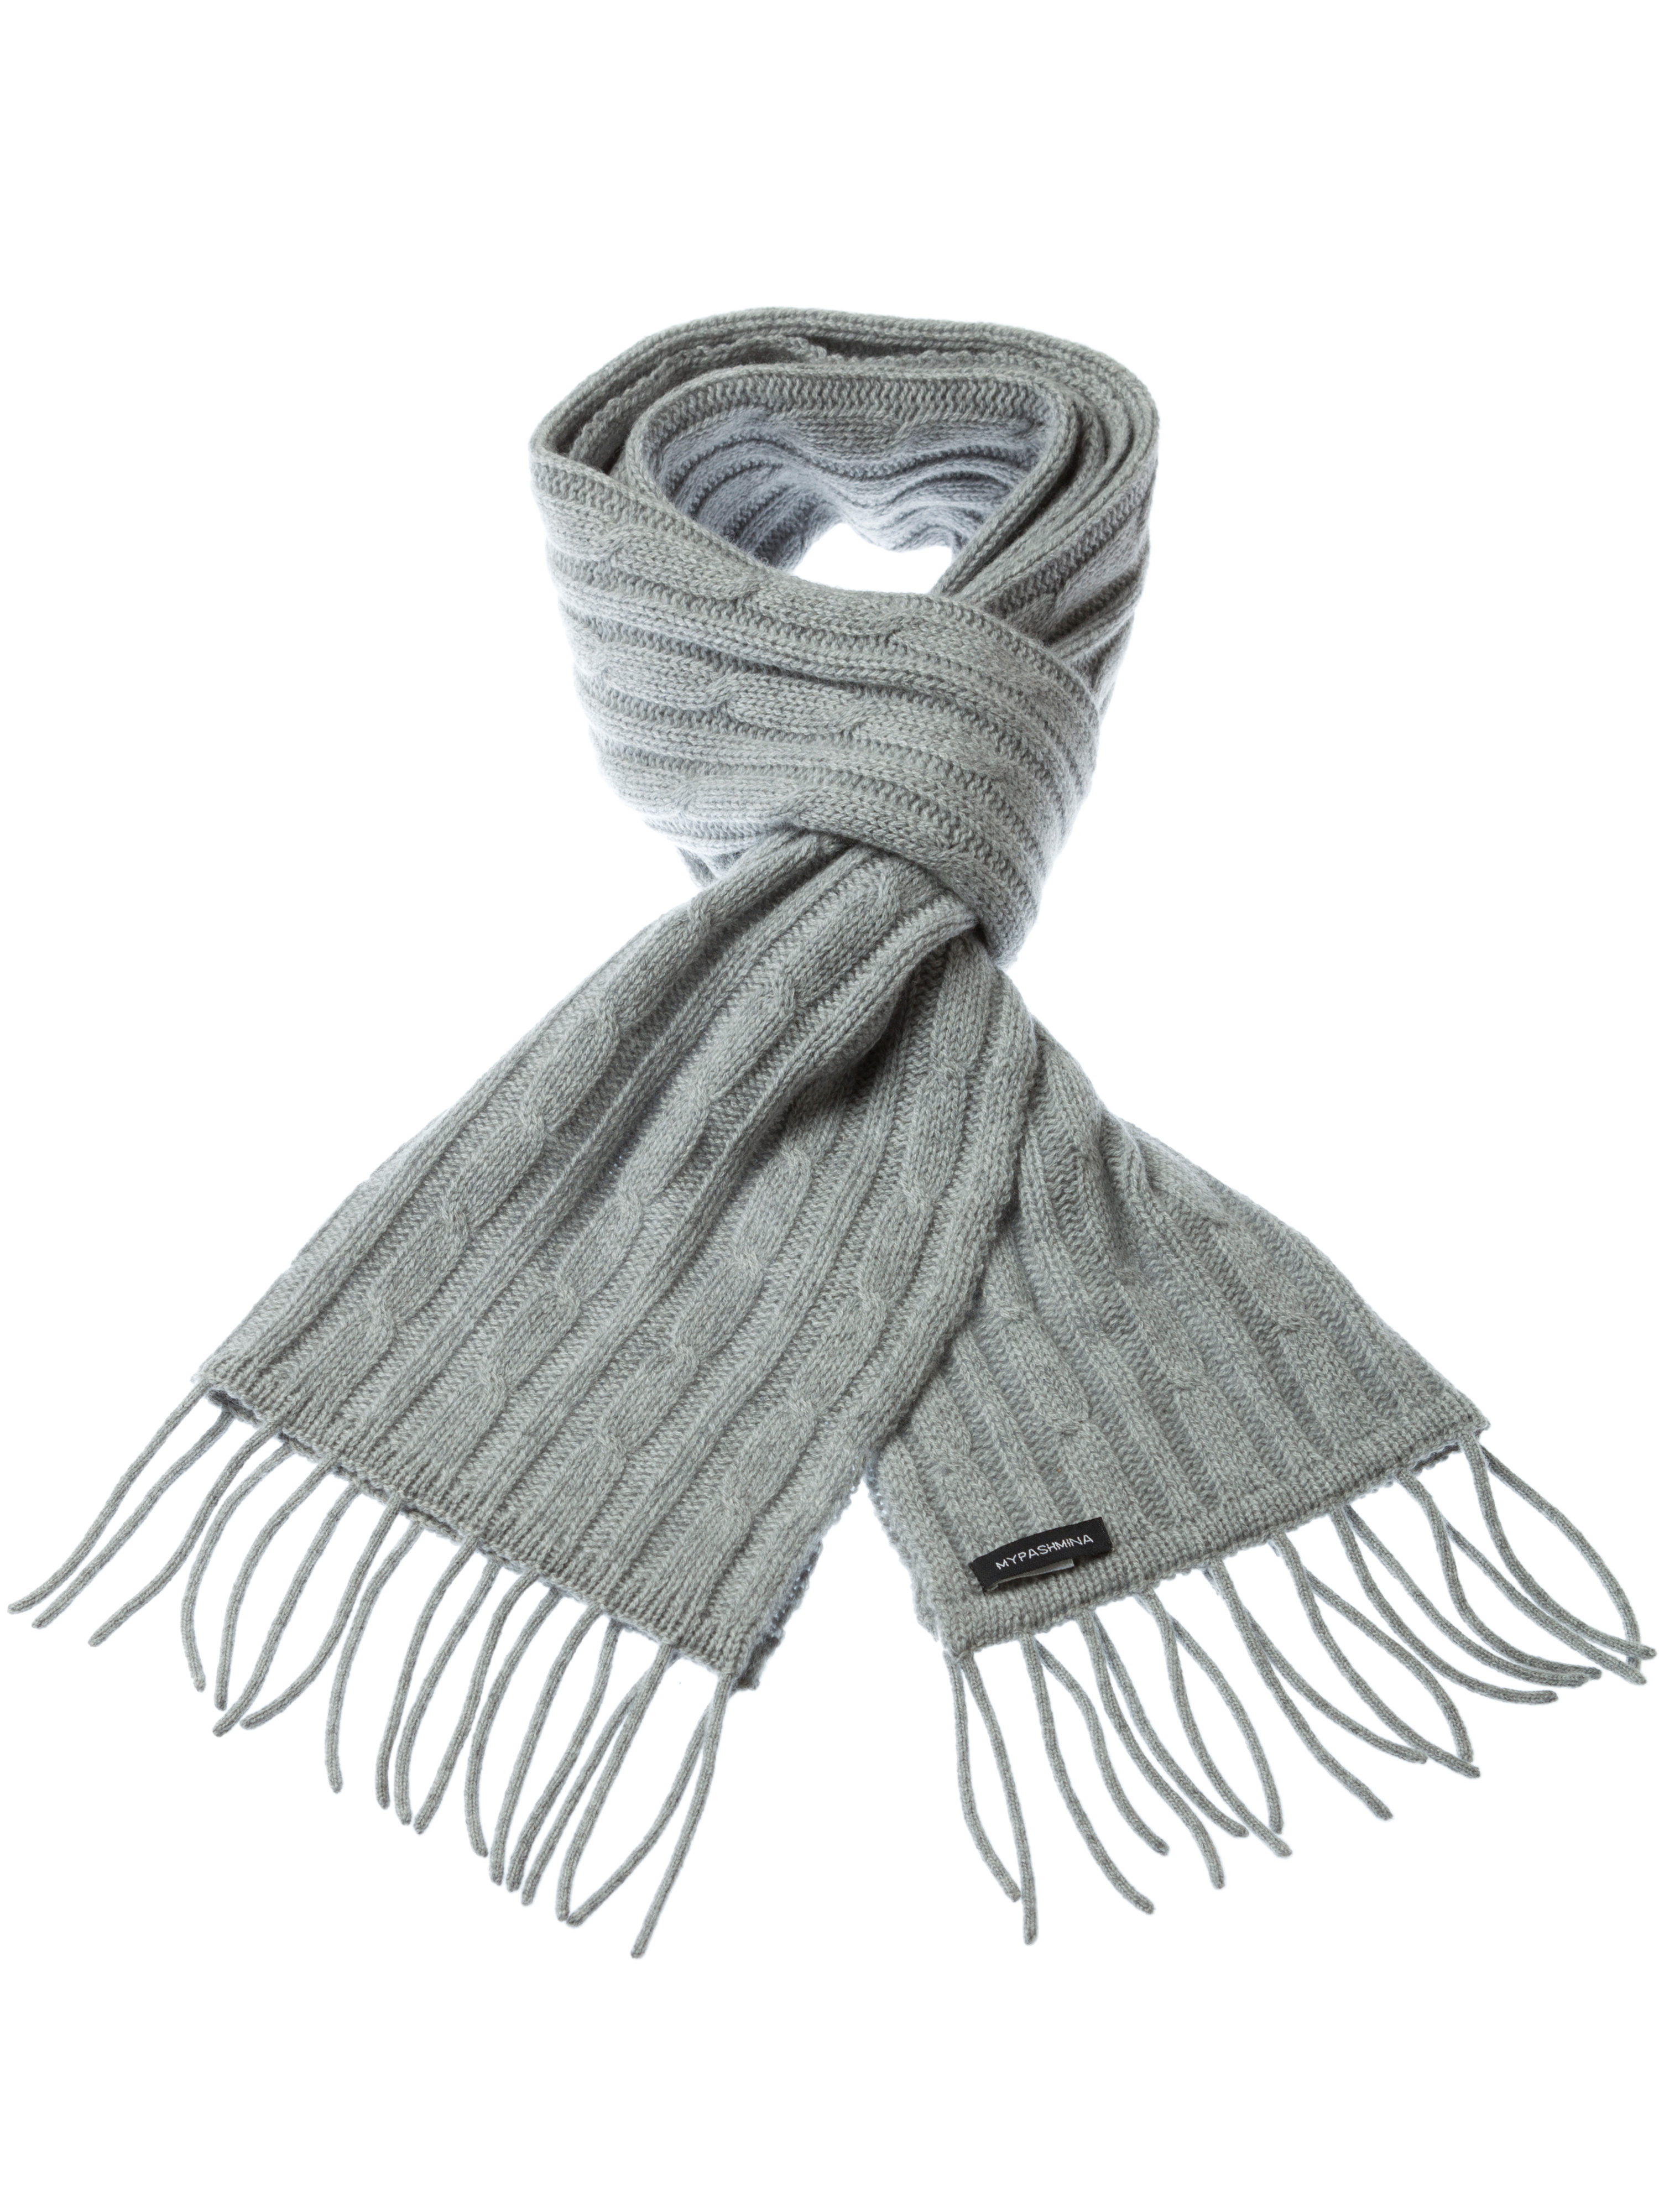 Cable Knit Scarf - 100% Cashmere - 35x180cm - Melange Light Grey